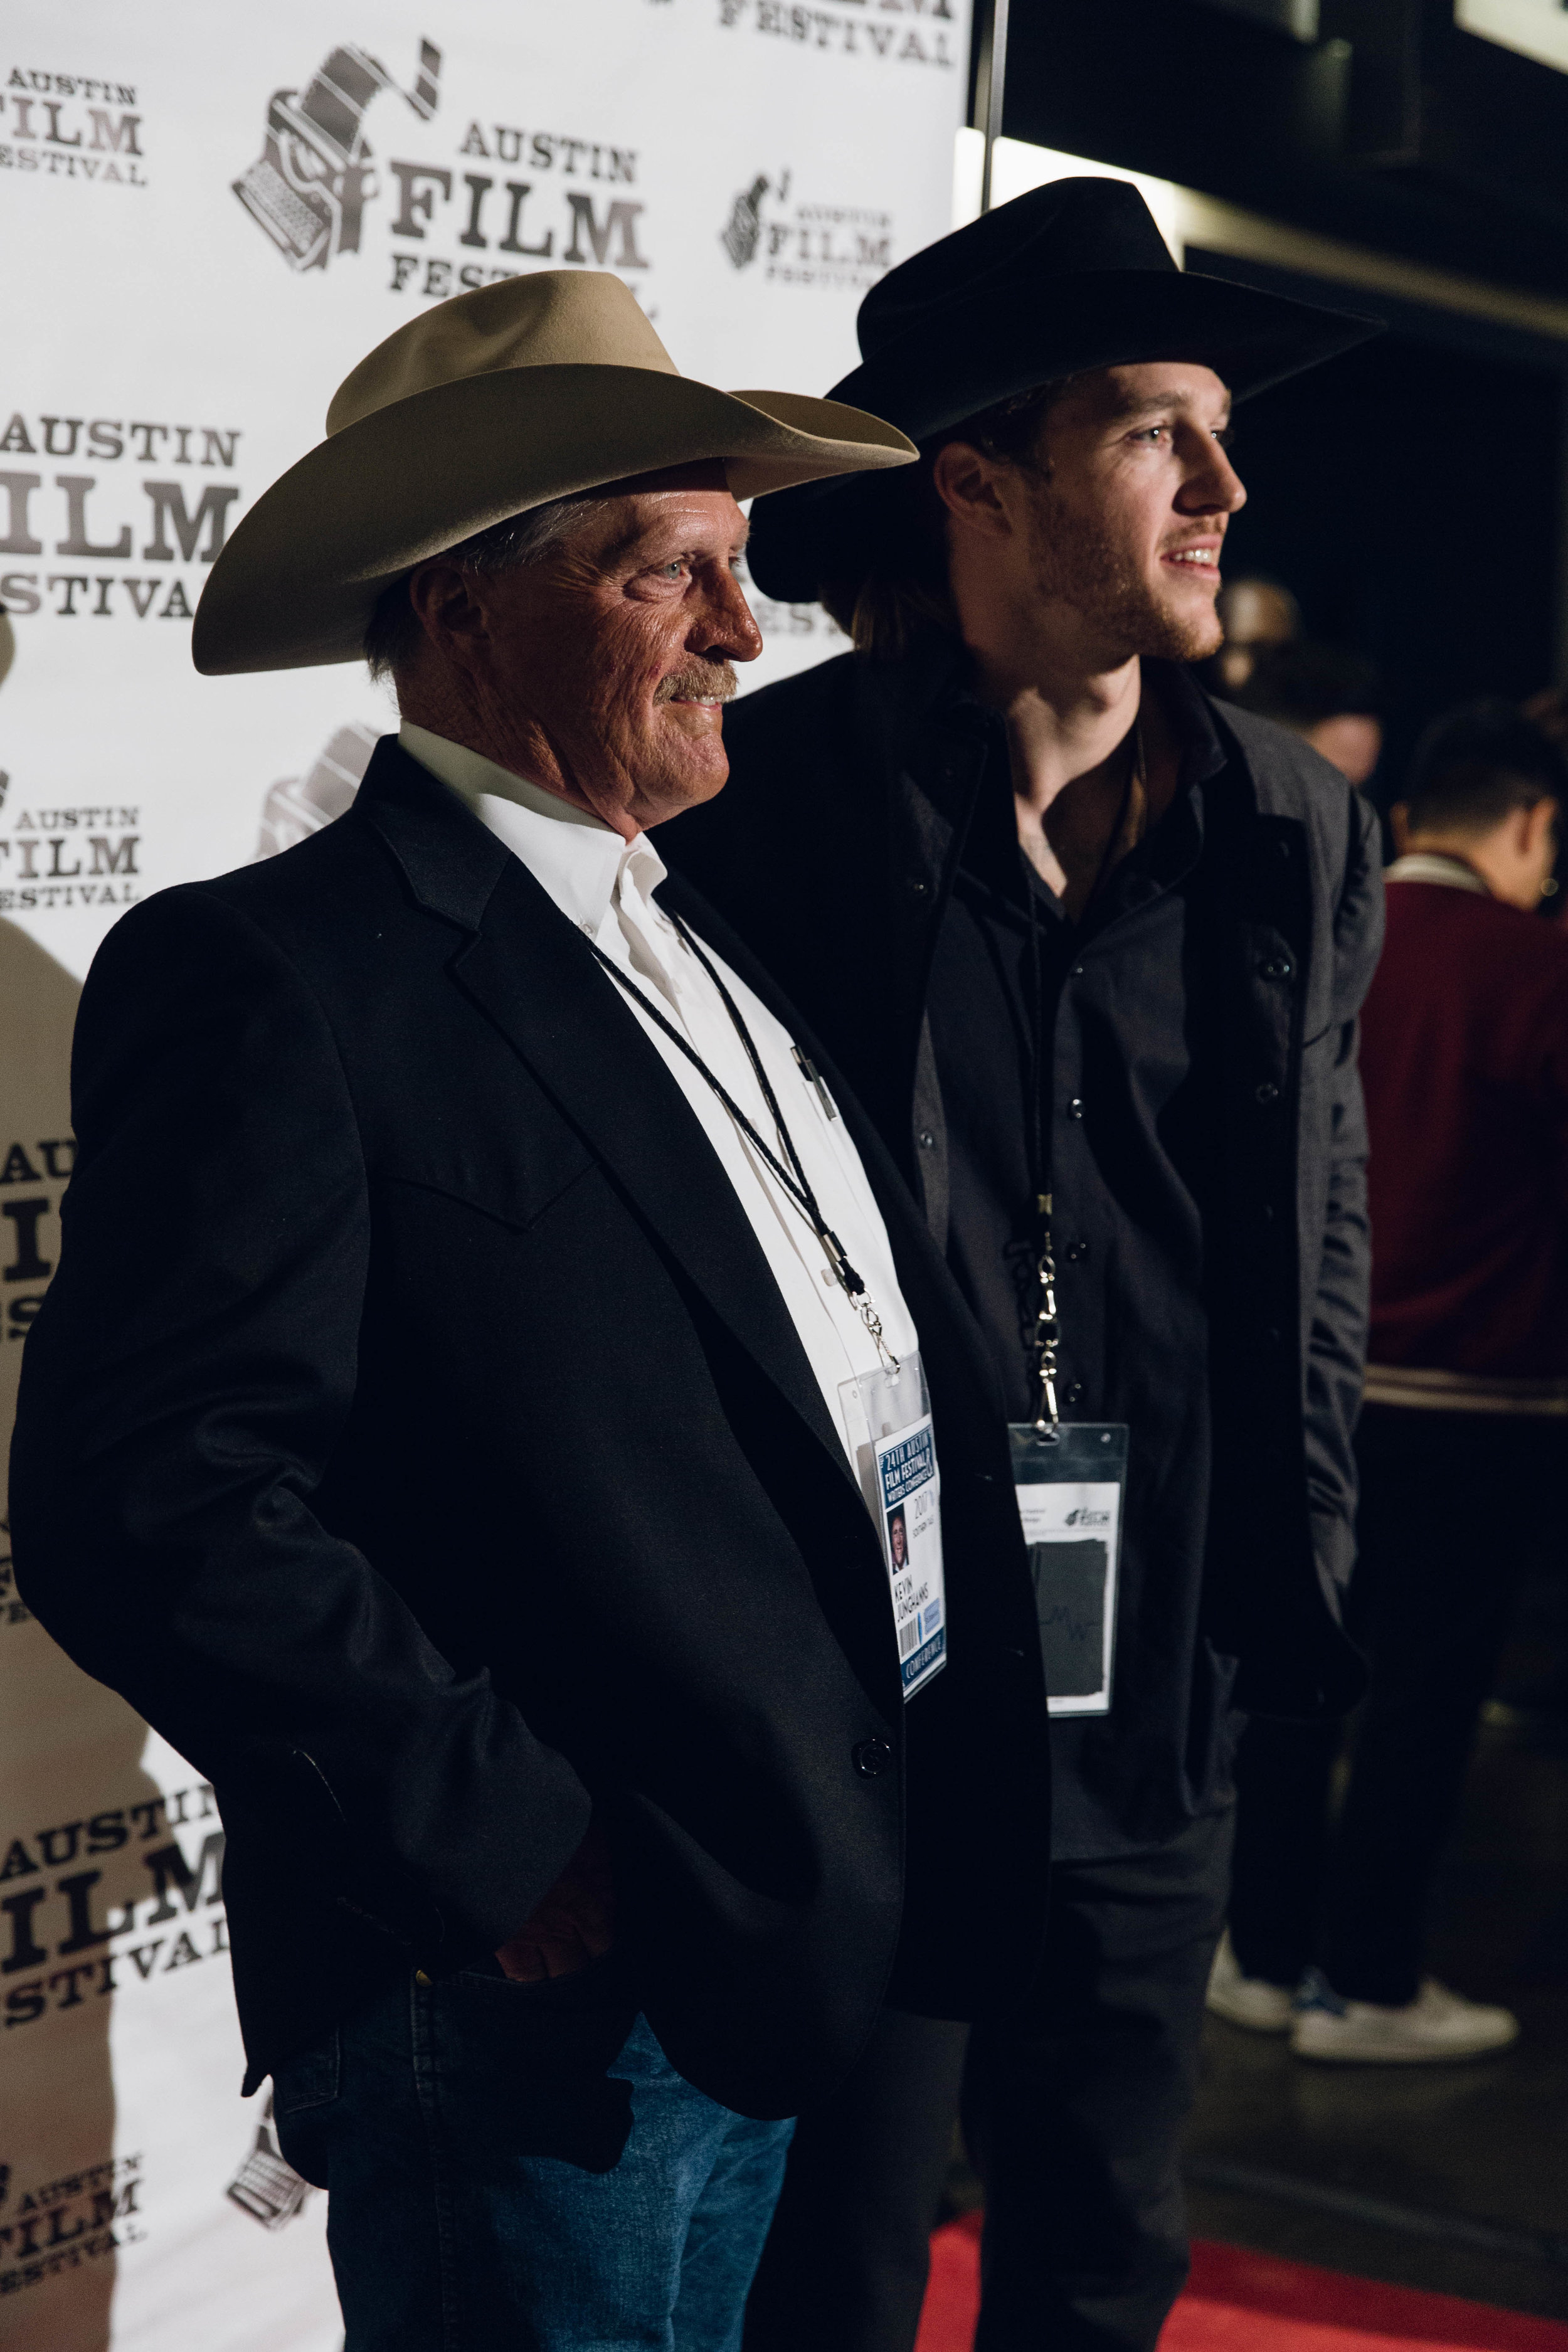 Southern-Tale-Austin-Film-Fest-Kirby-Gladstein-2017-2972.jpg